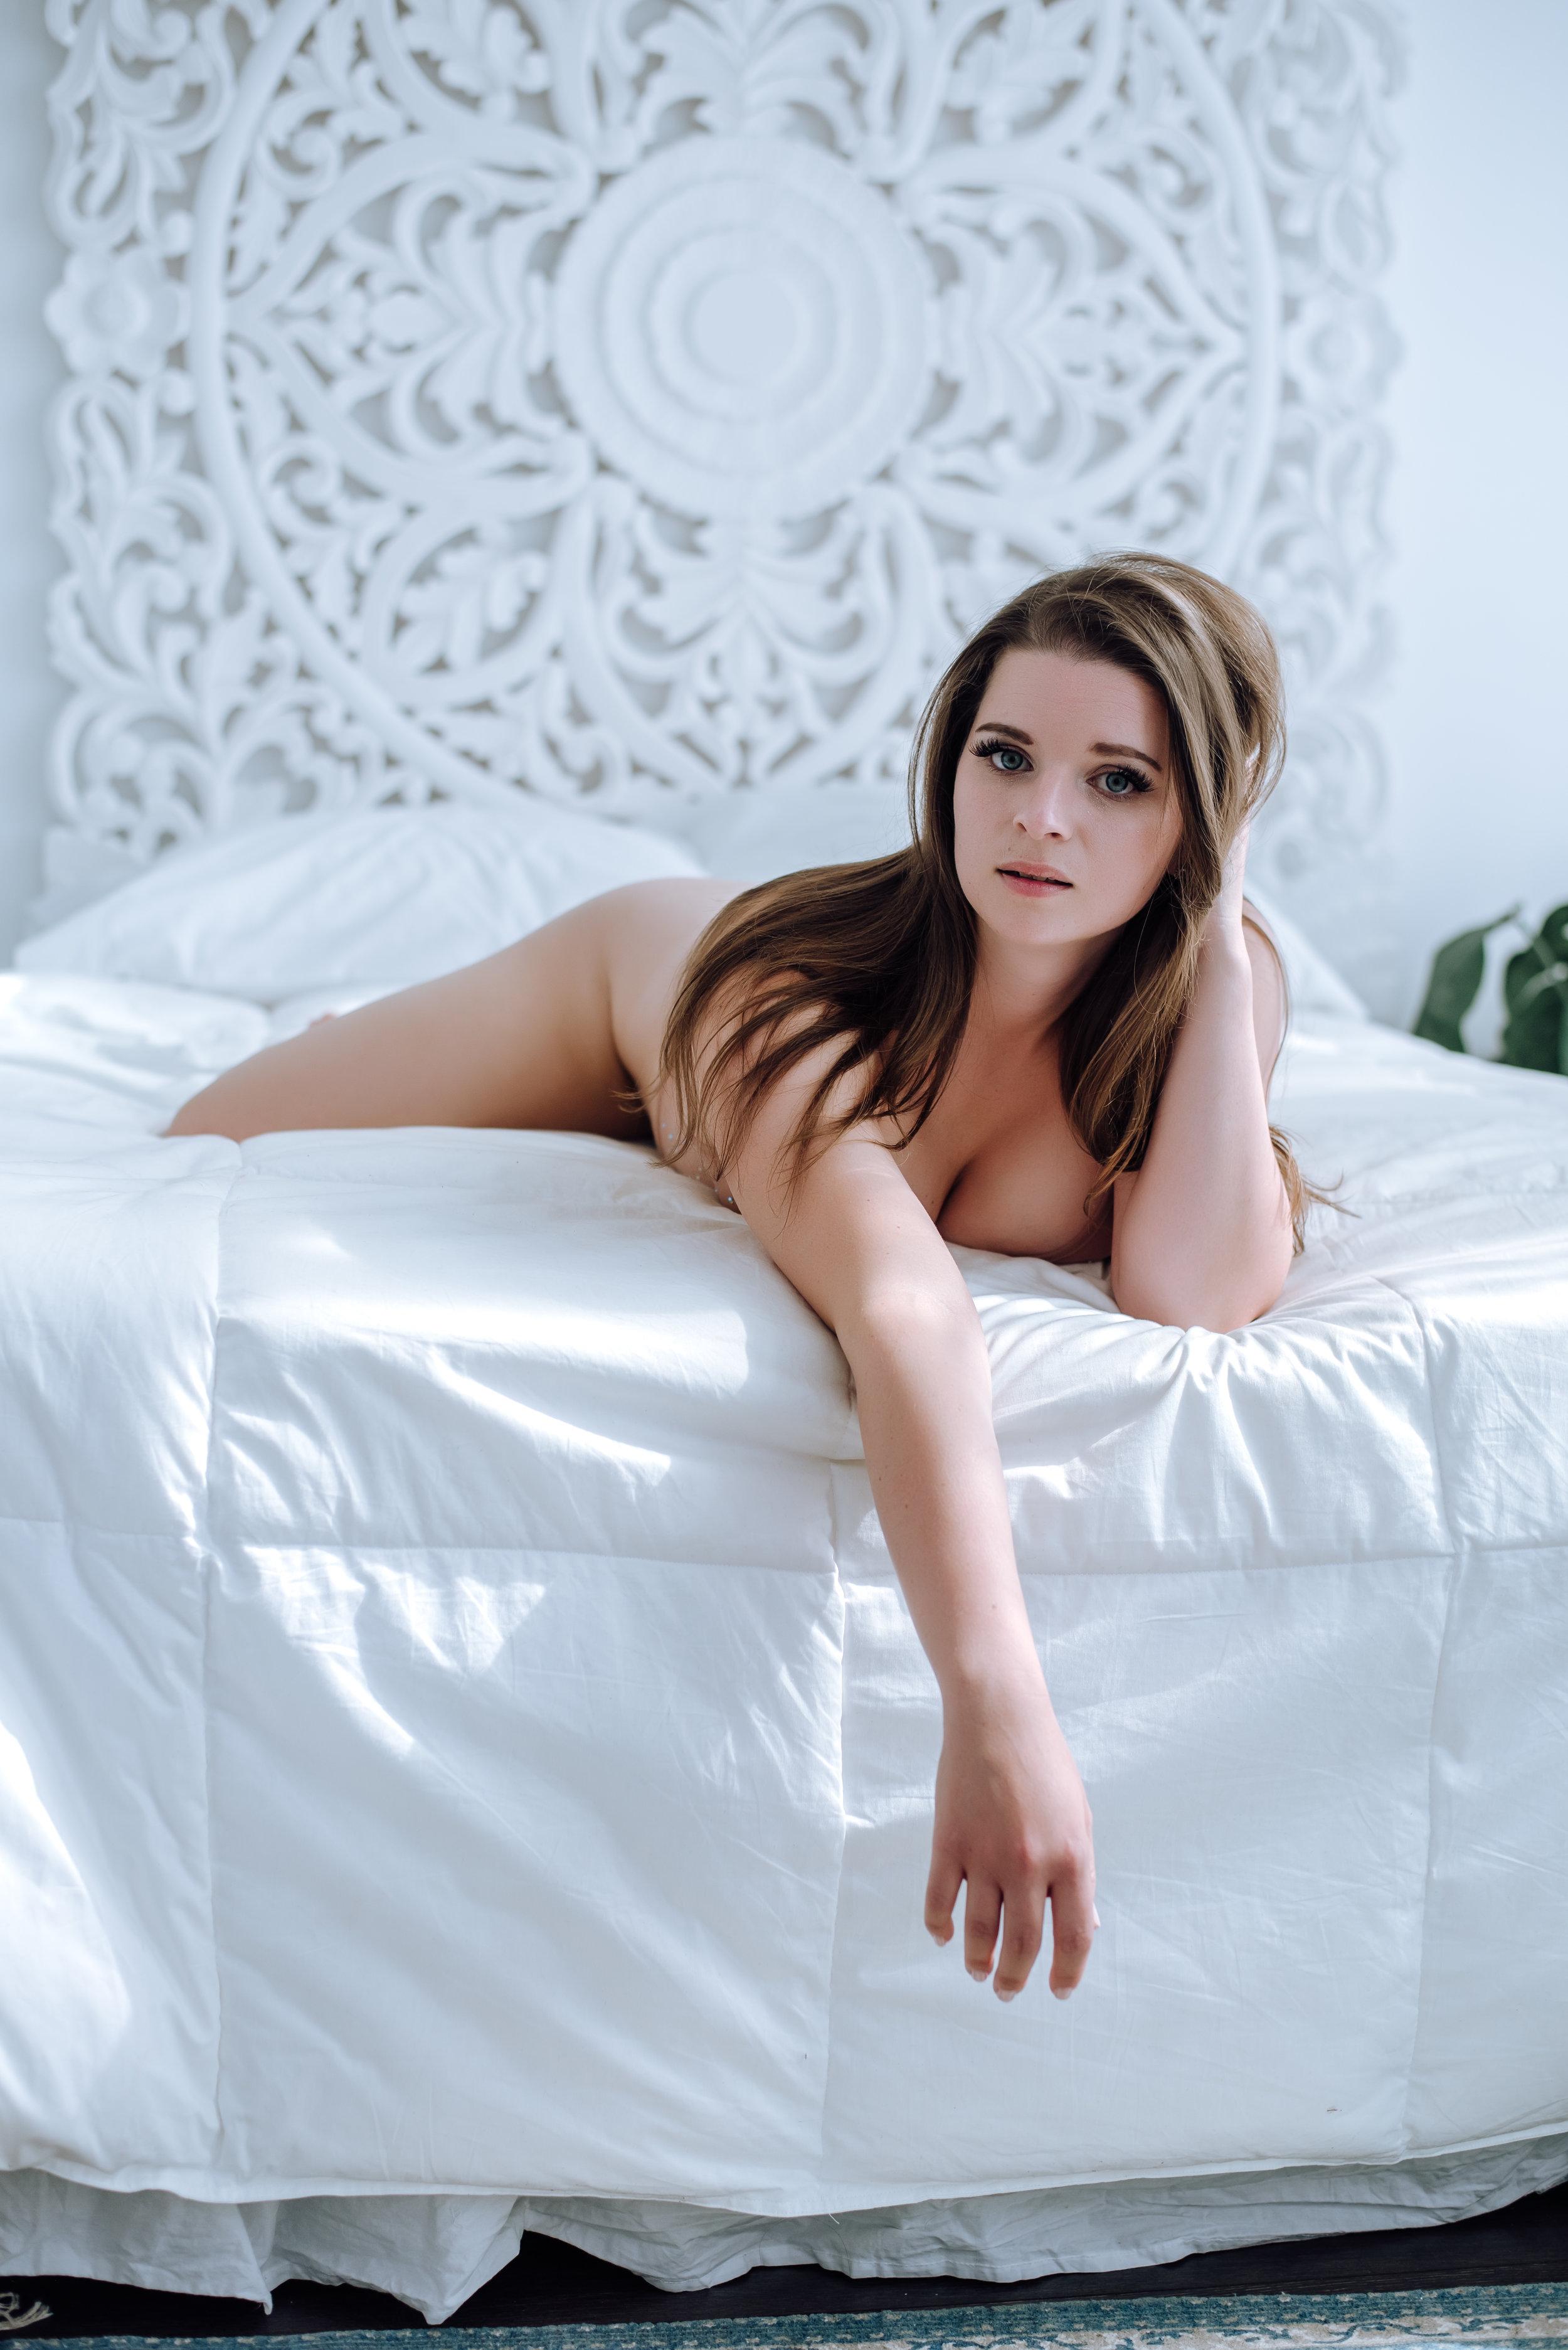 boudoir-photography-best-in-berks-7.jpg